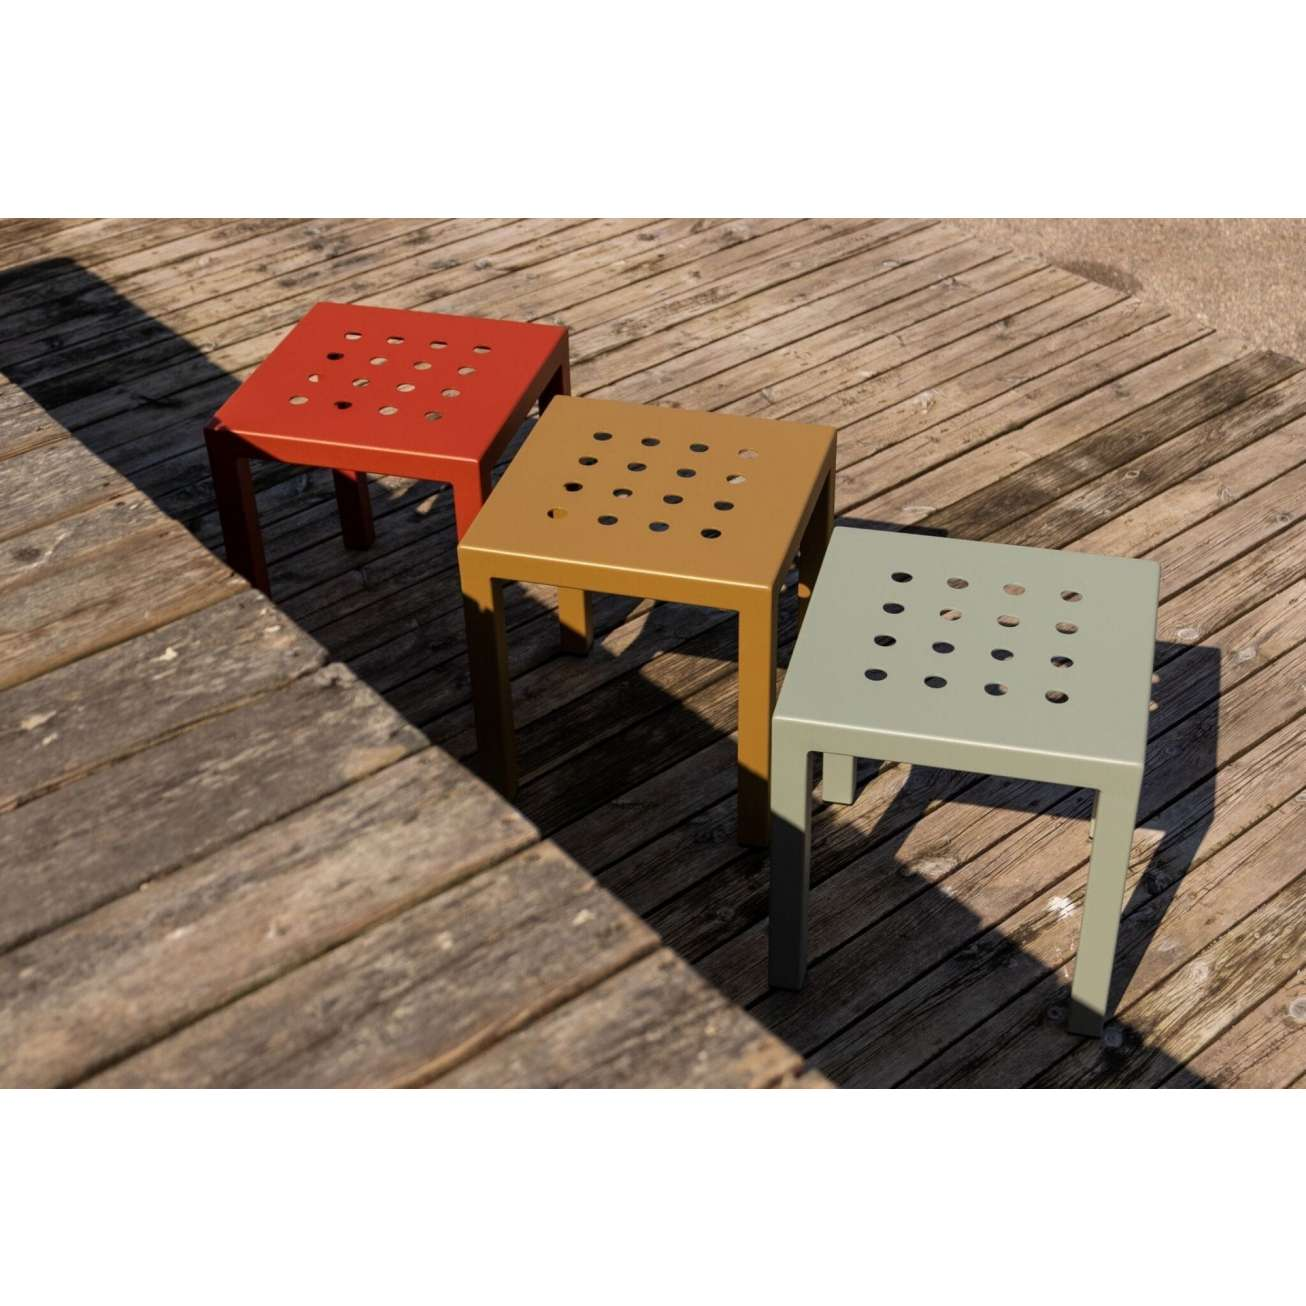 Krakk-sundays Hagemøbler og utemøbler - Fine design